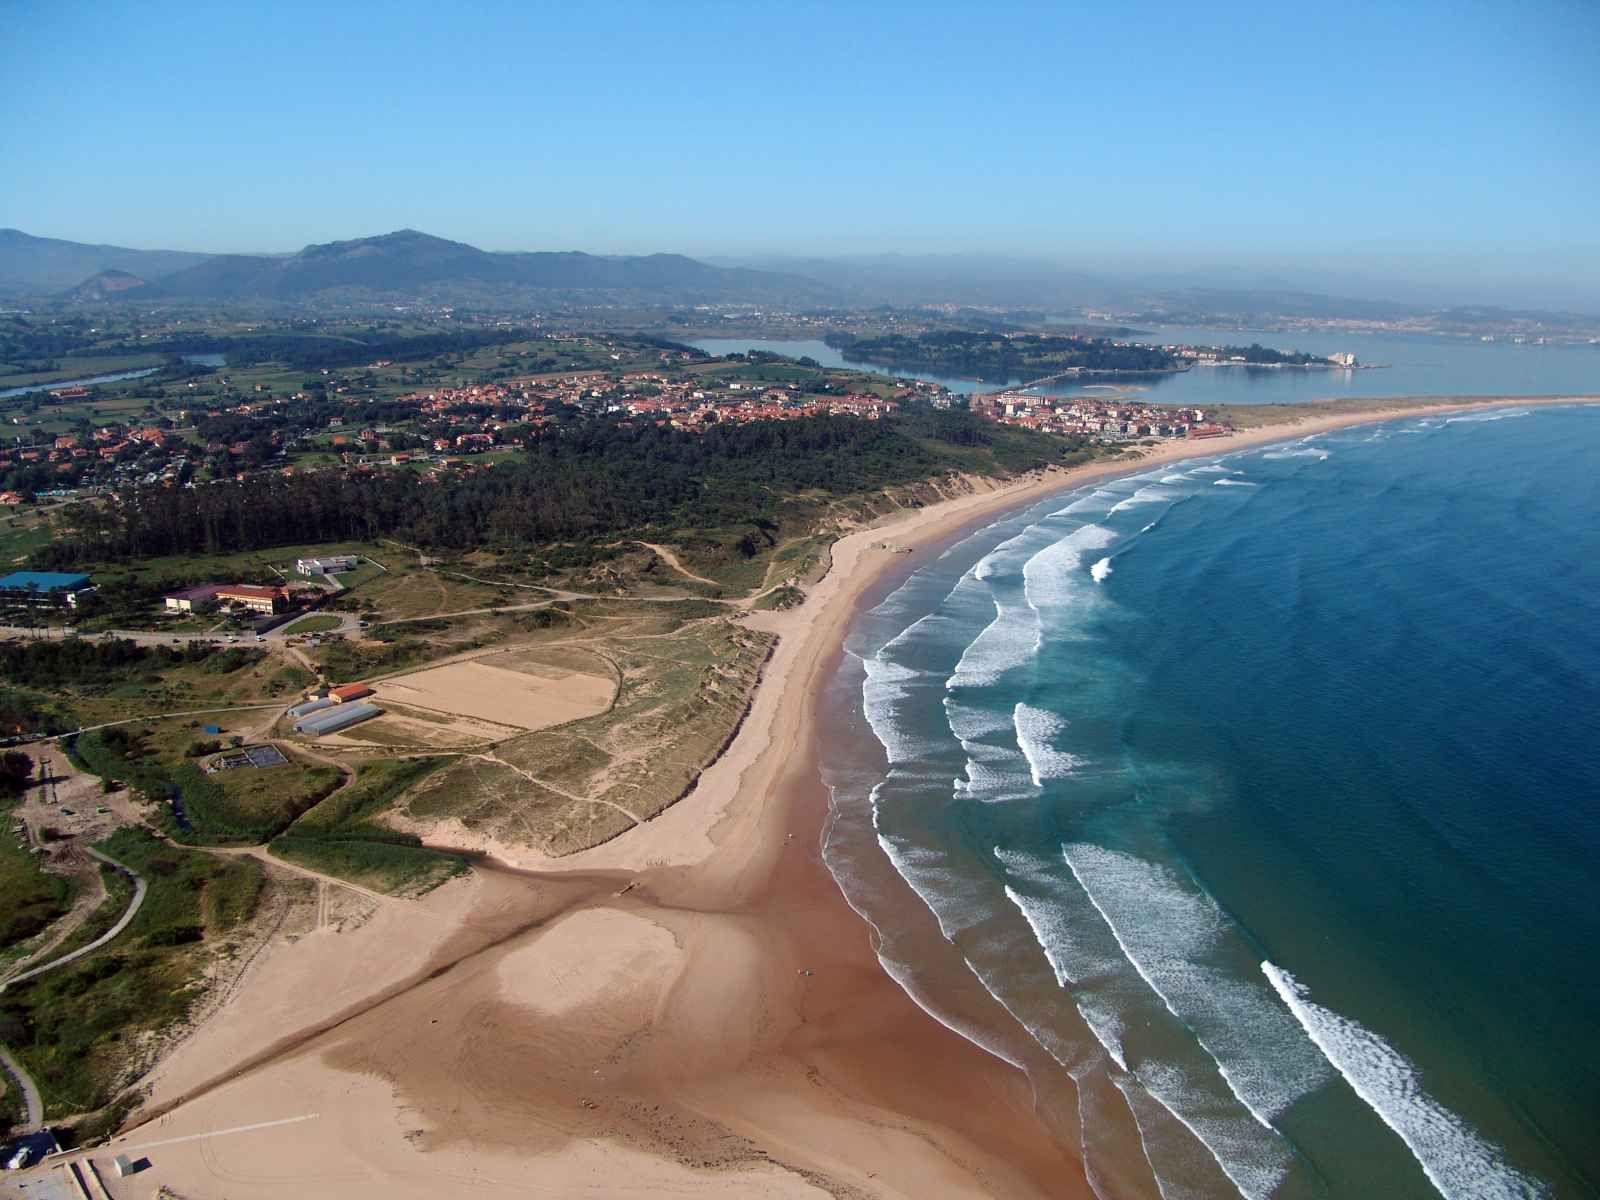 Playa Somo en Ribamontán del Mar. Más info: http://lamejorplaya.es ...